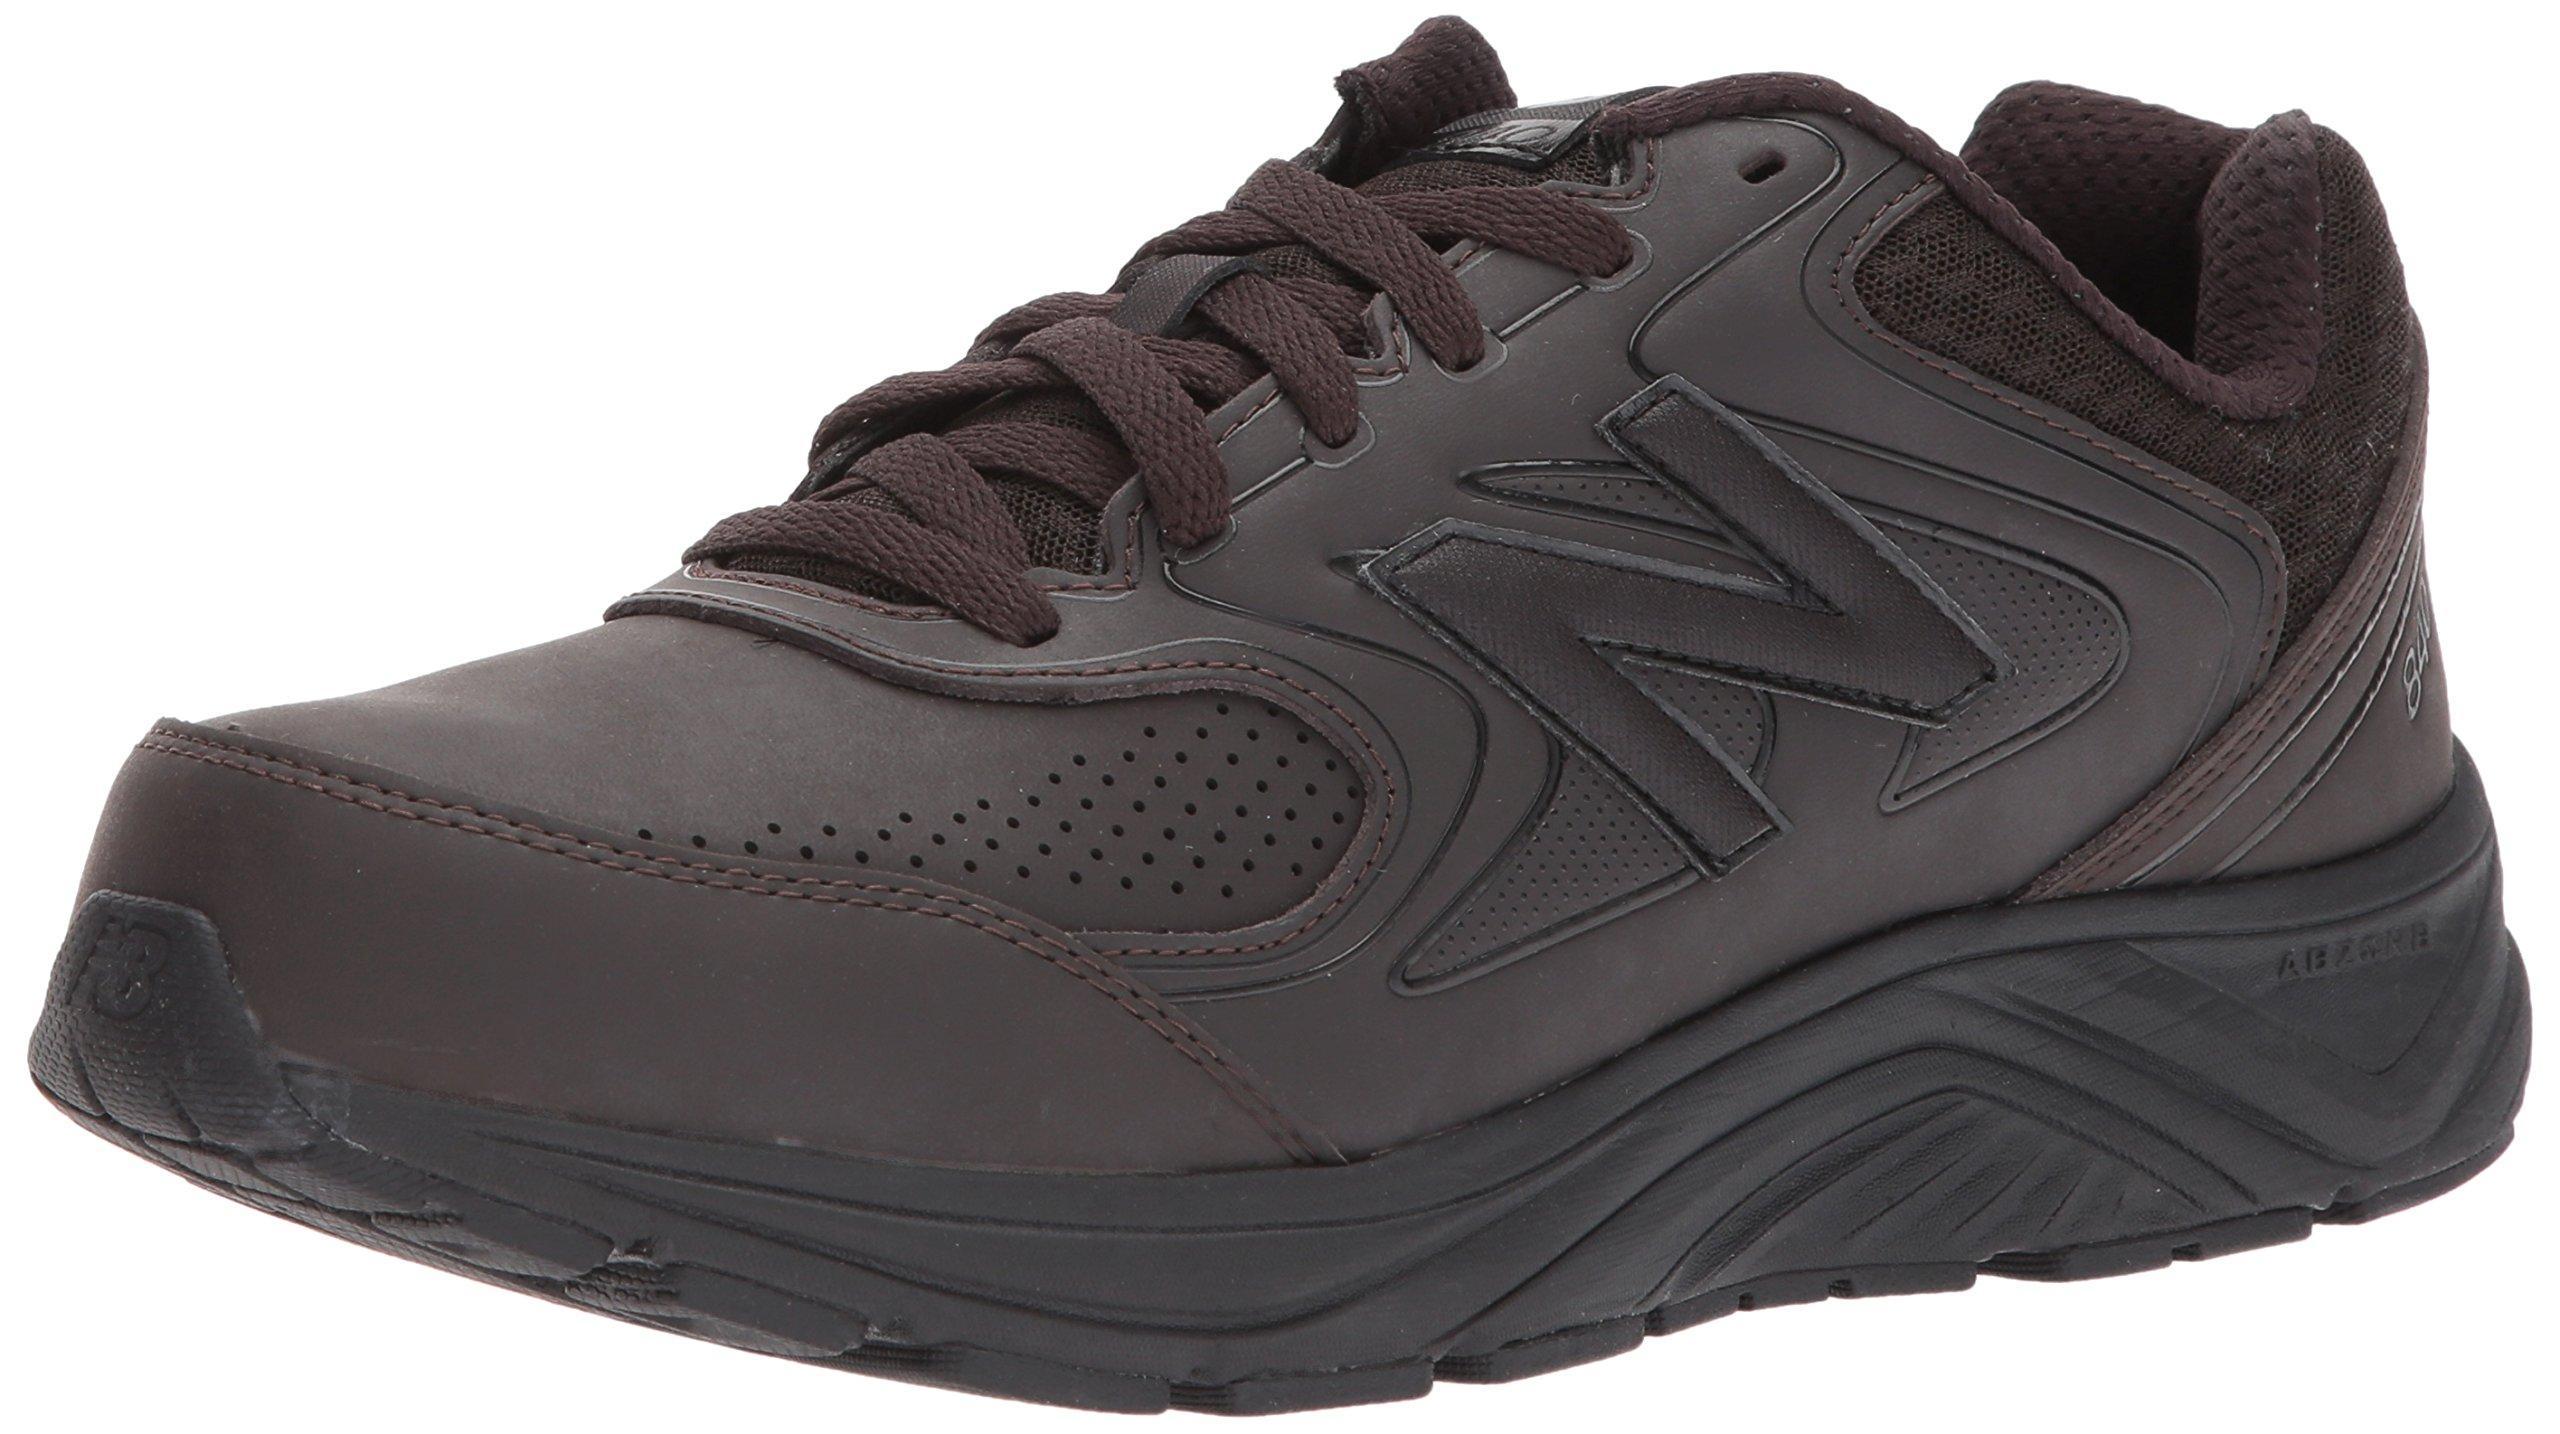 Mw840v2 Walking Shoe